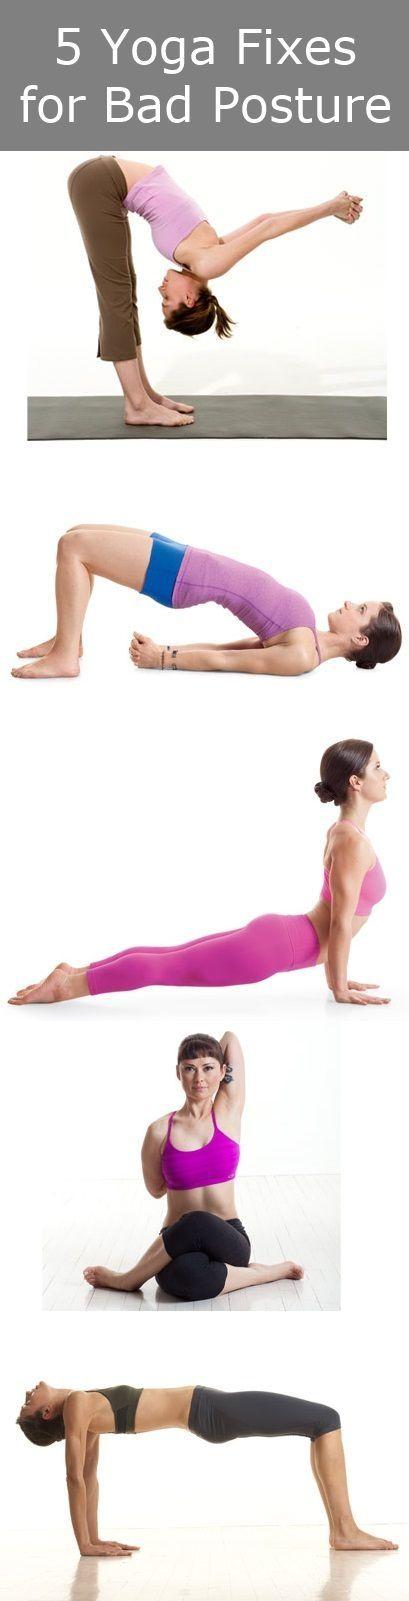 #yoga and #posture